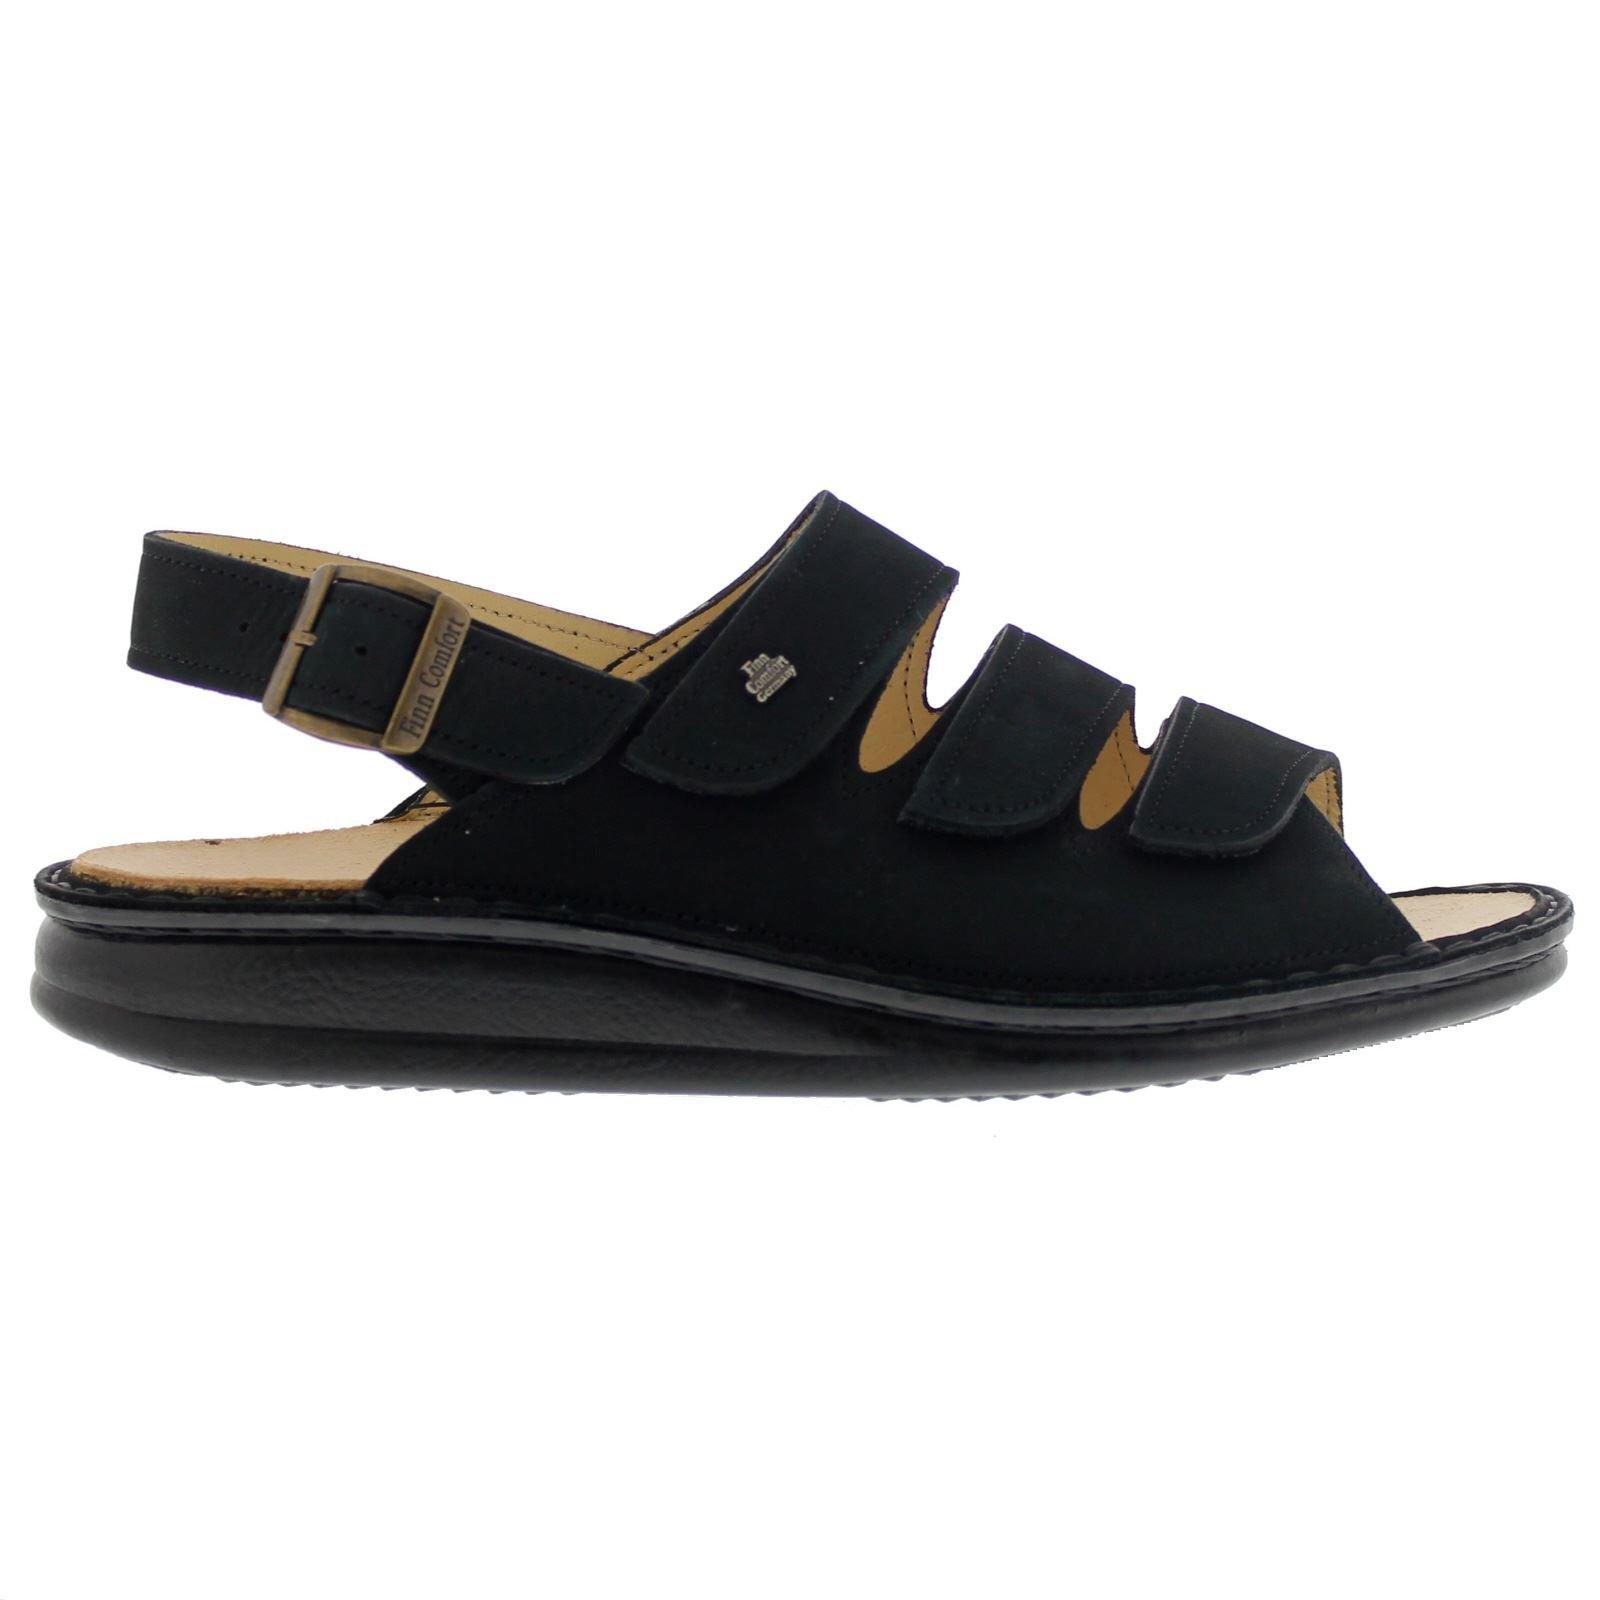 Finn Comfort Womens 2509 Sylt Black Nubuck Sandals 39 EU